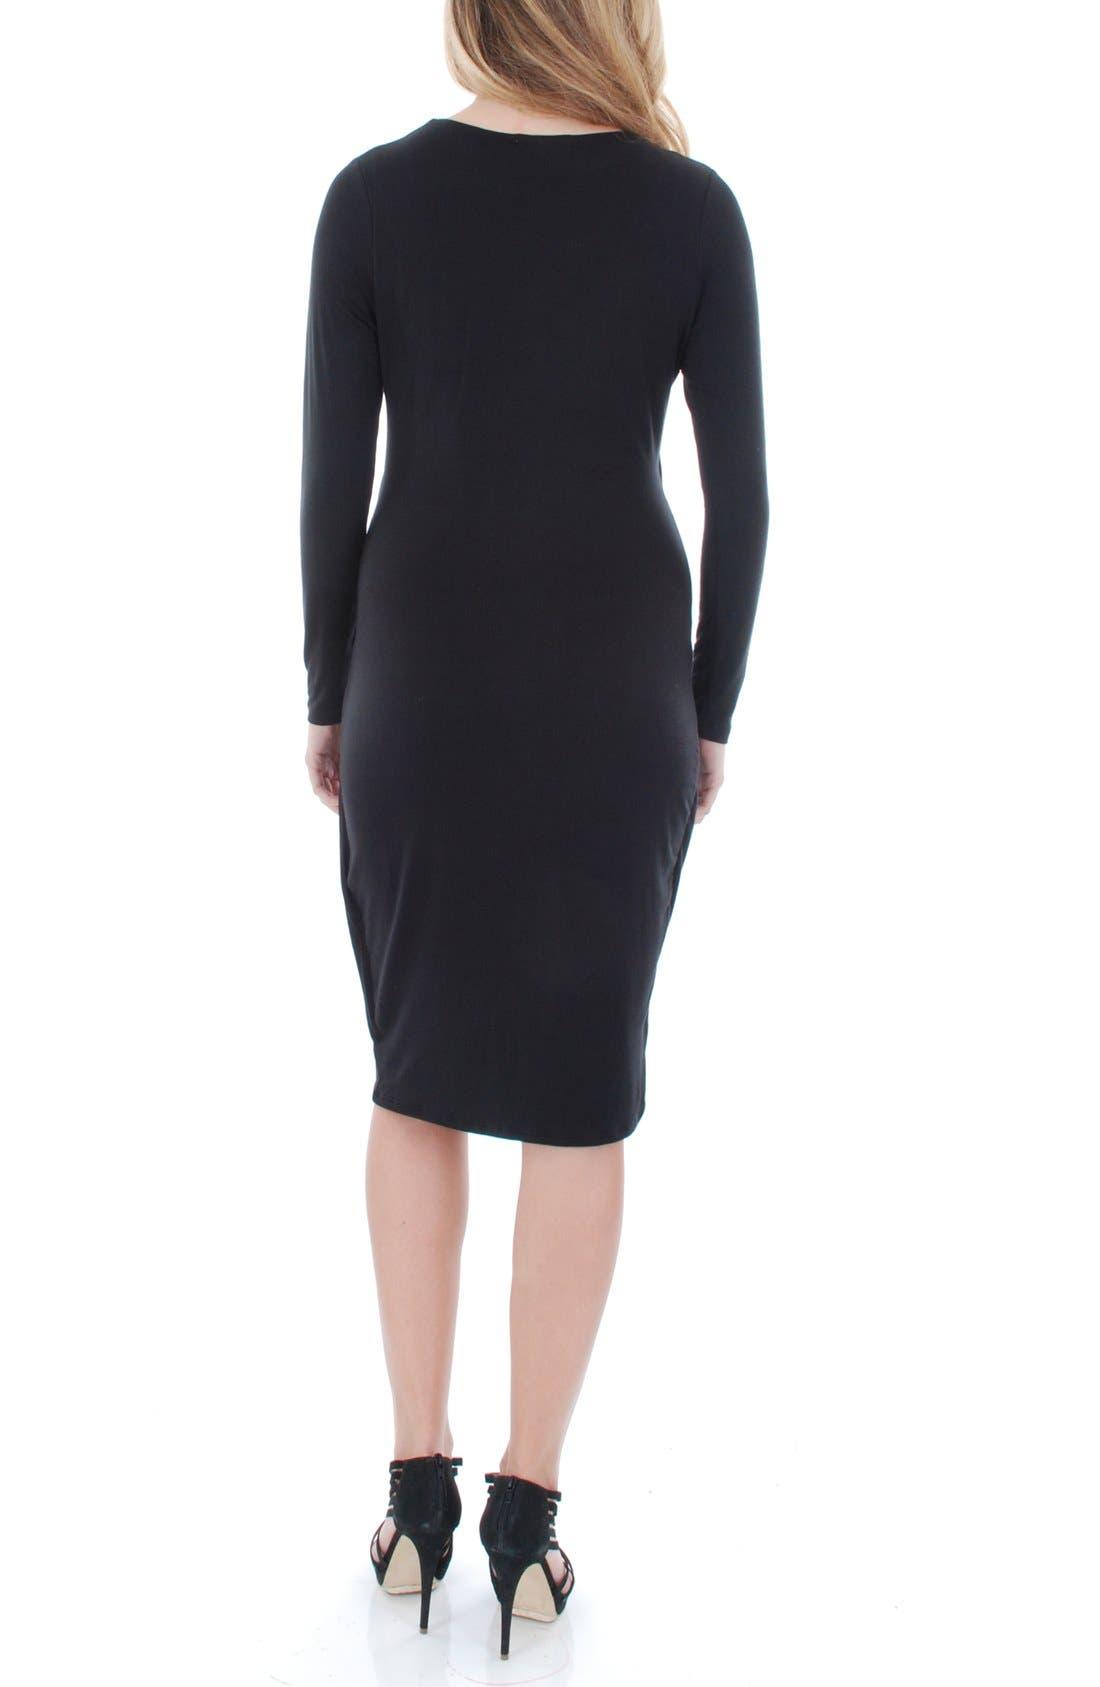 Alternate Image 3  - Everly Grey 'Sloan' Maternity/Nursing Dress